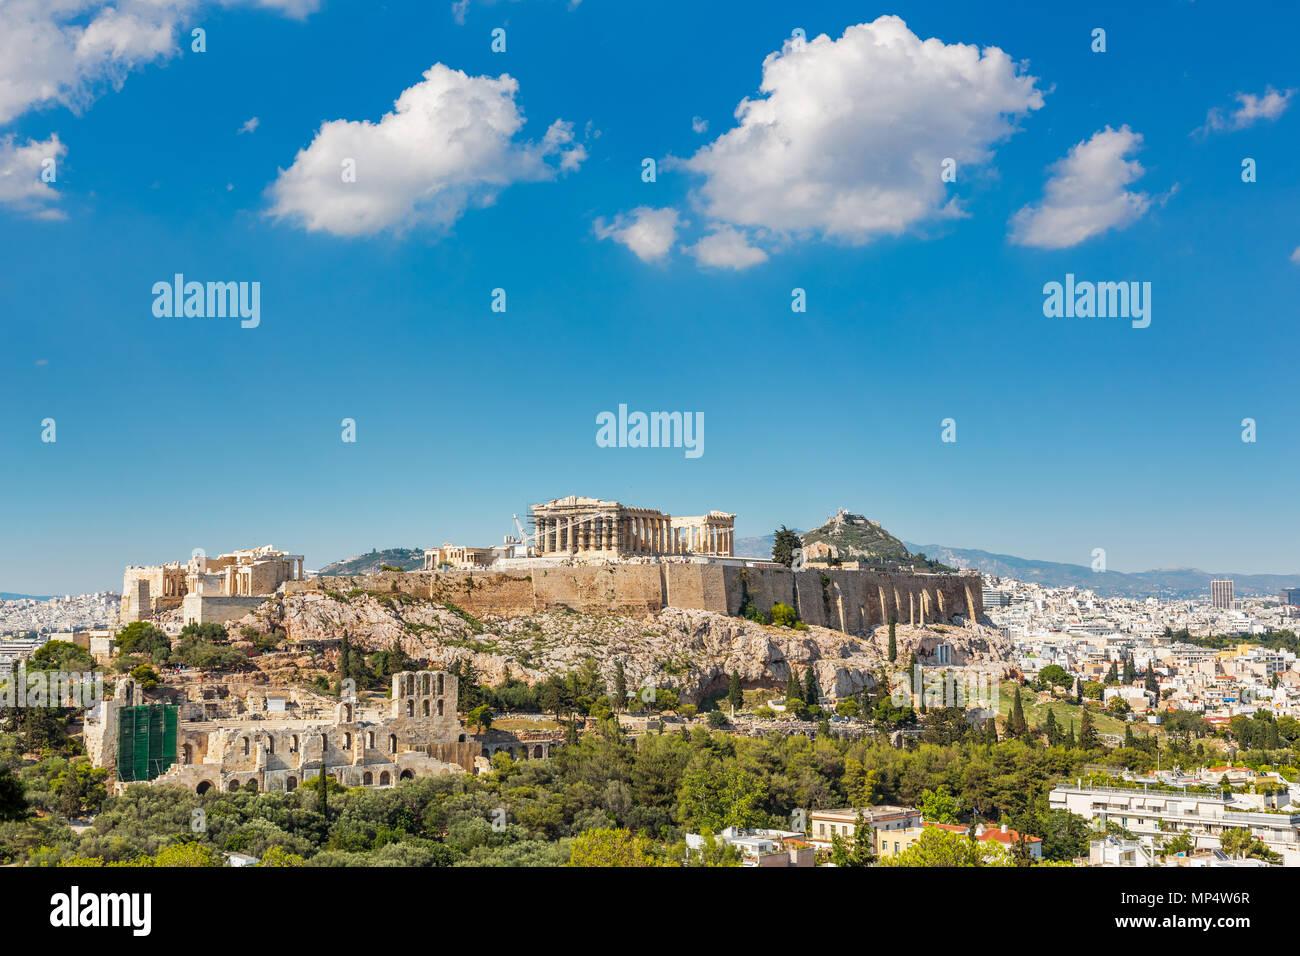 Acropolis of Athens, Greece - Stock Image